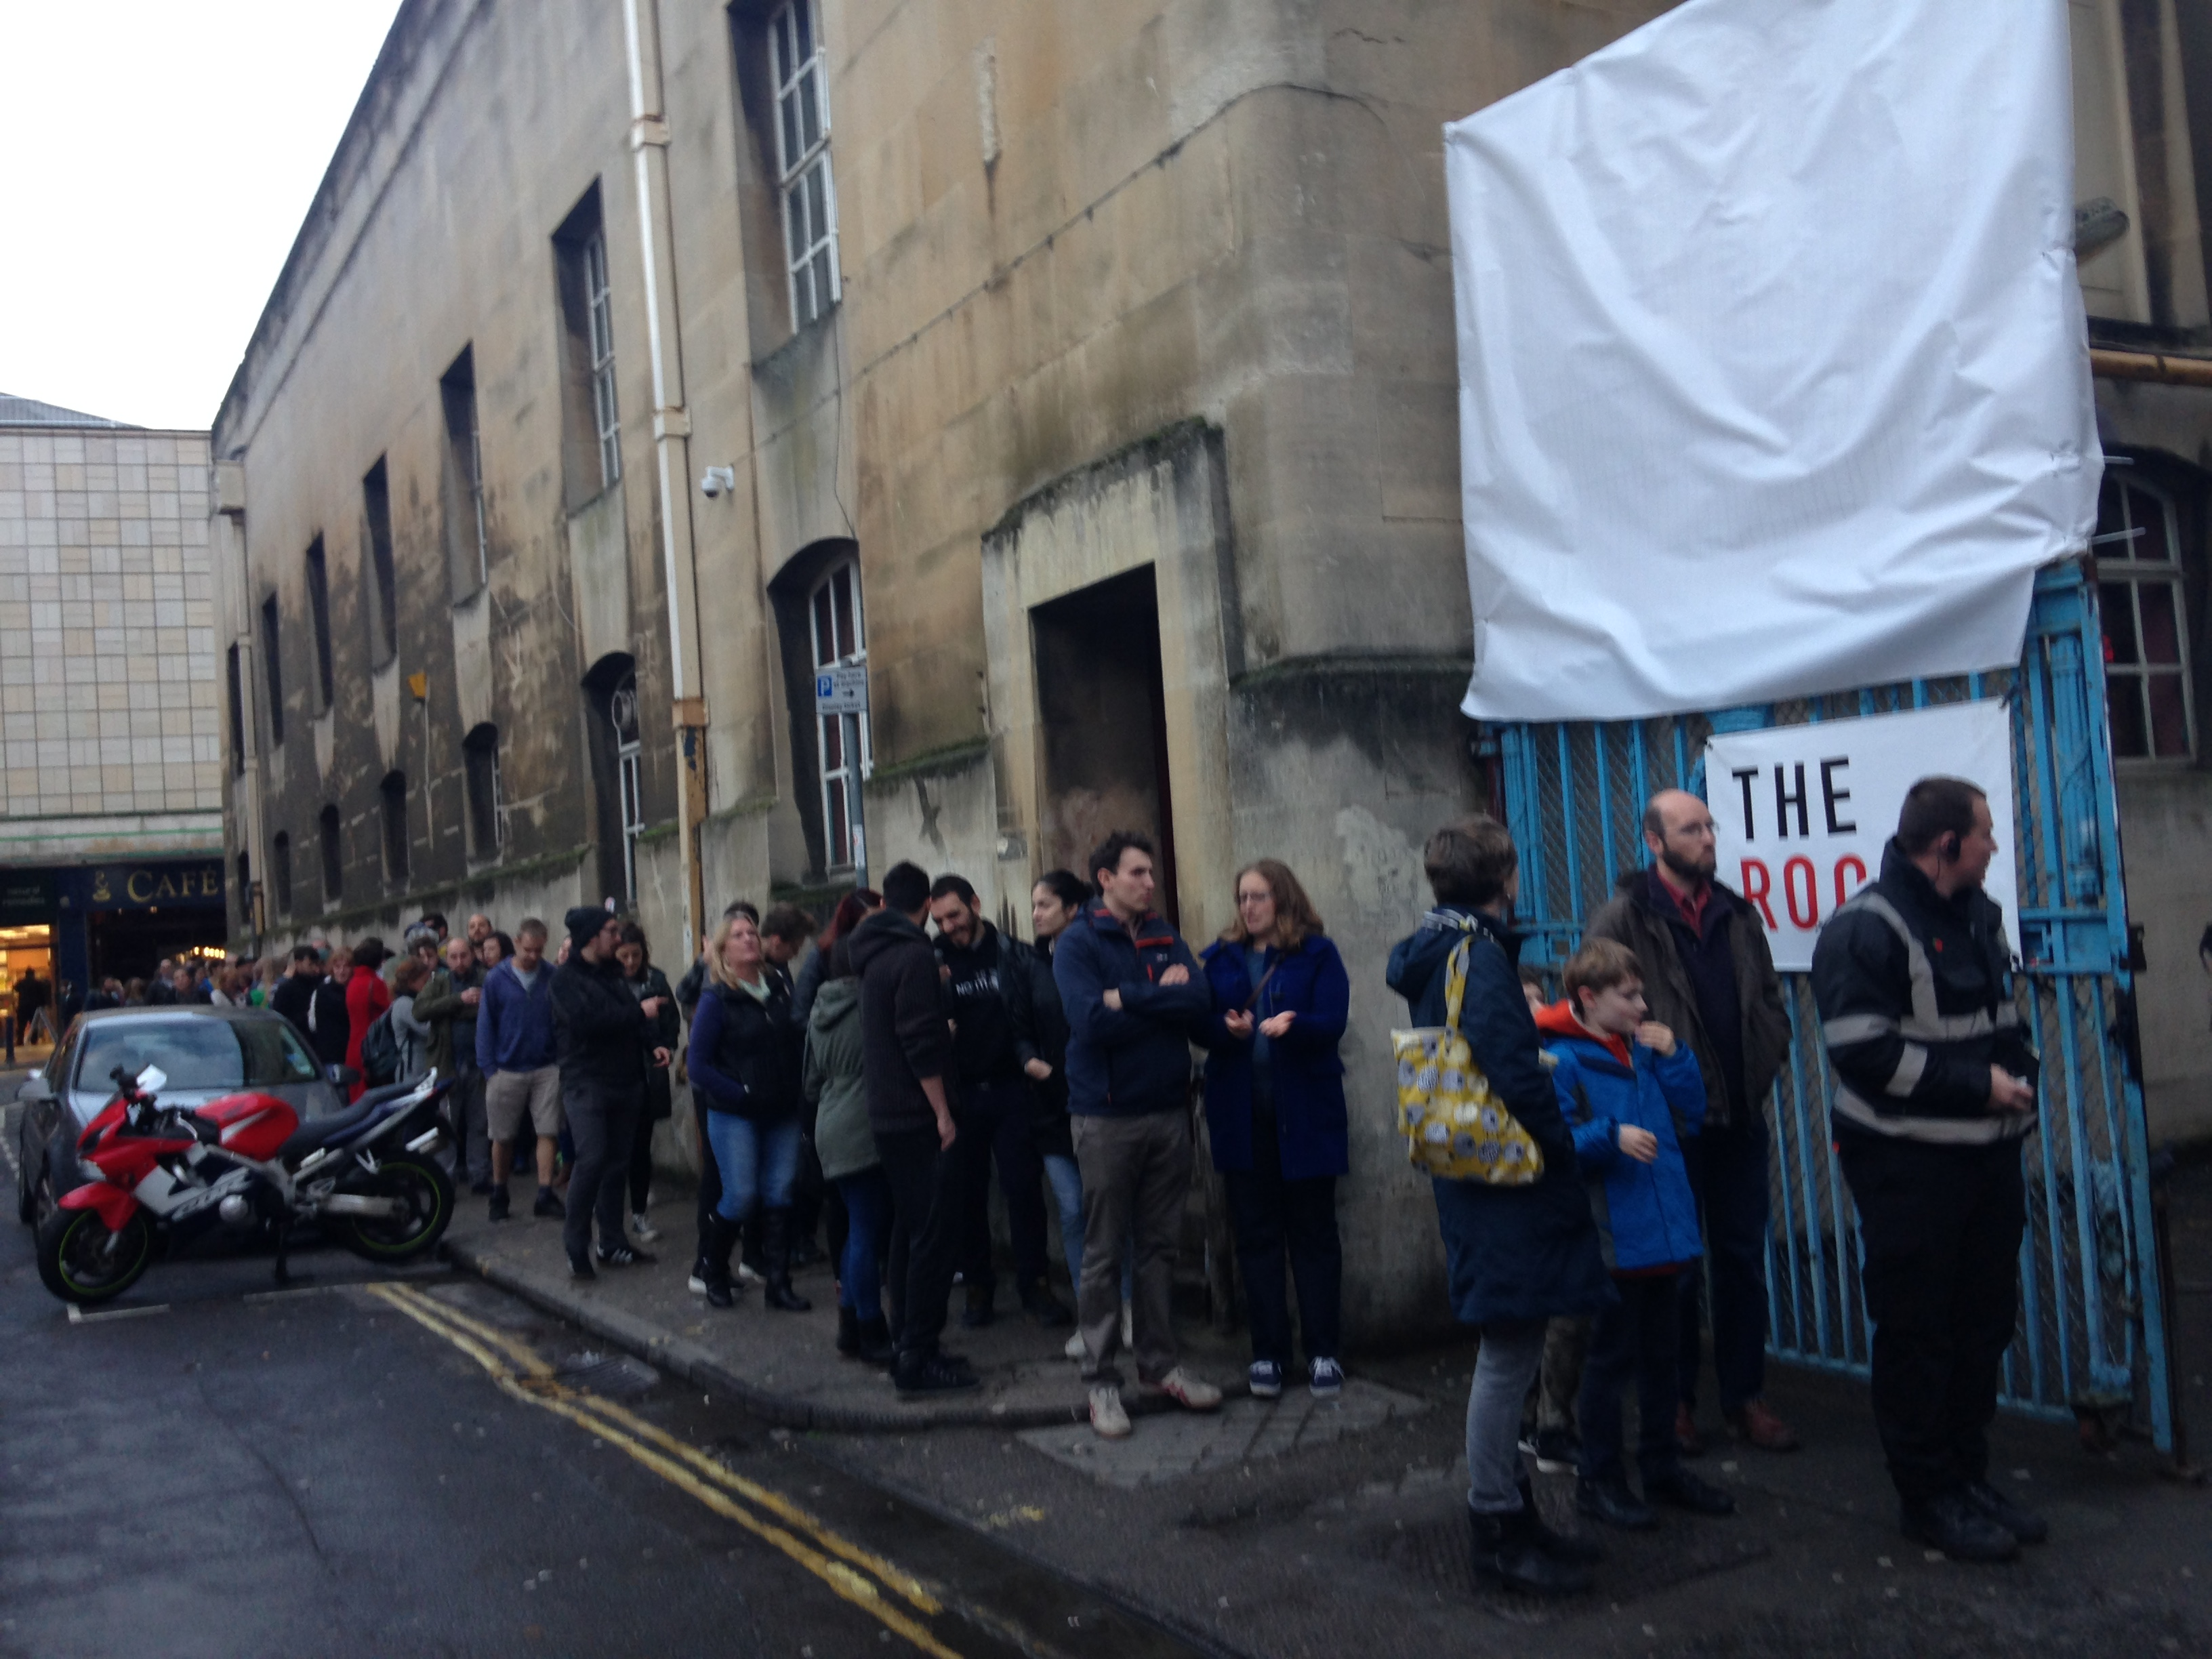 The Rooms queue